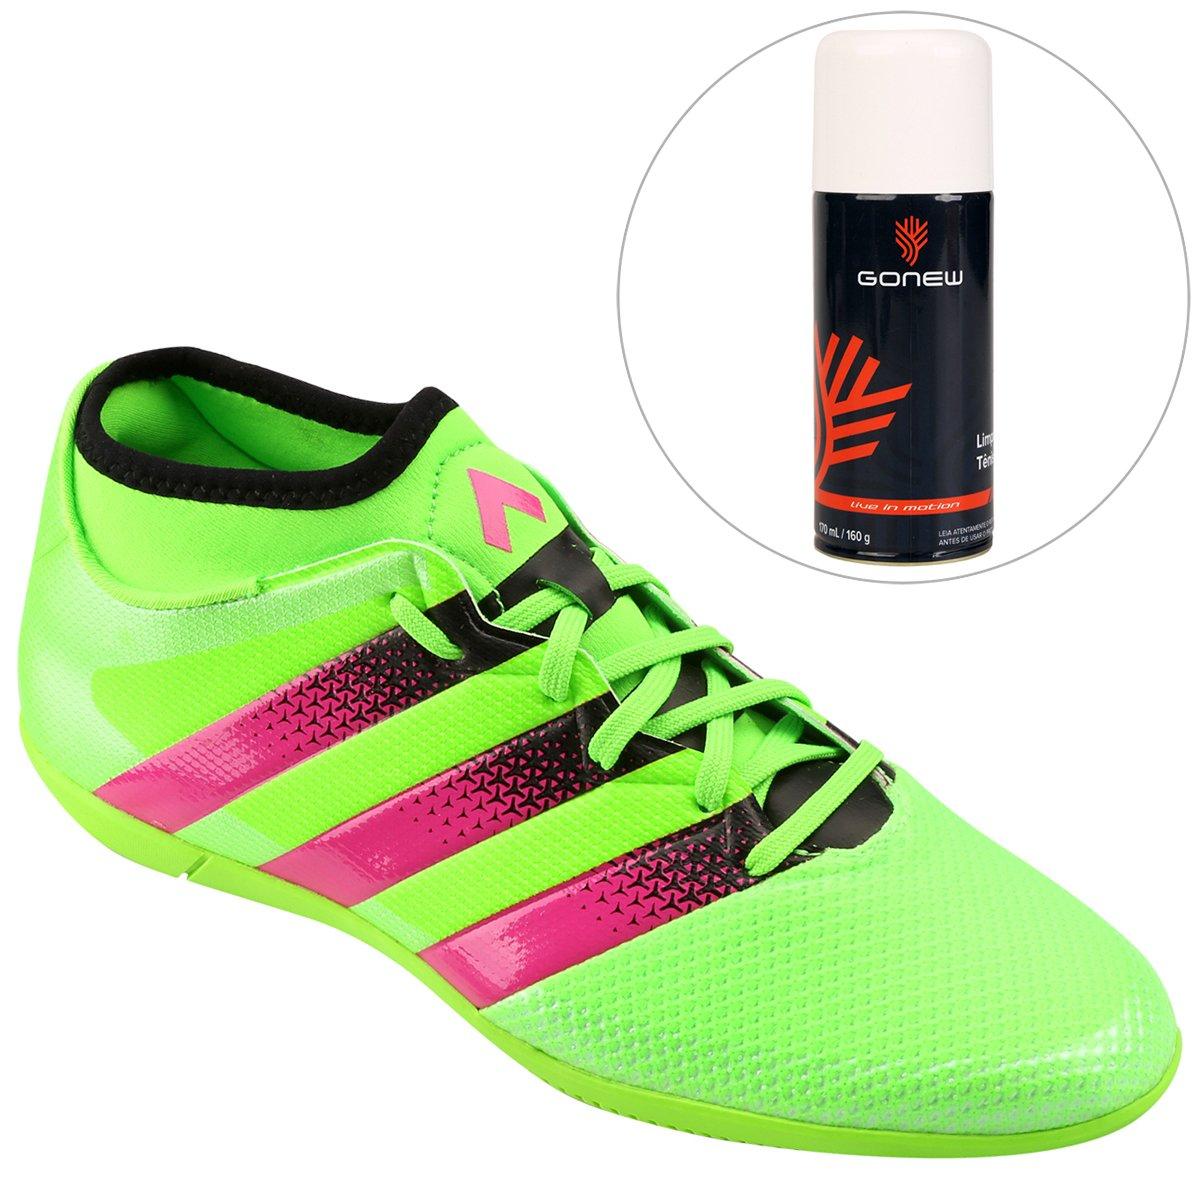 d5a4c5b07e Kit Chuteira Adidas Ace 16.3 Primemesh IN Futsal + Limpa Tênis - Gonew -  Compre Agora